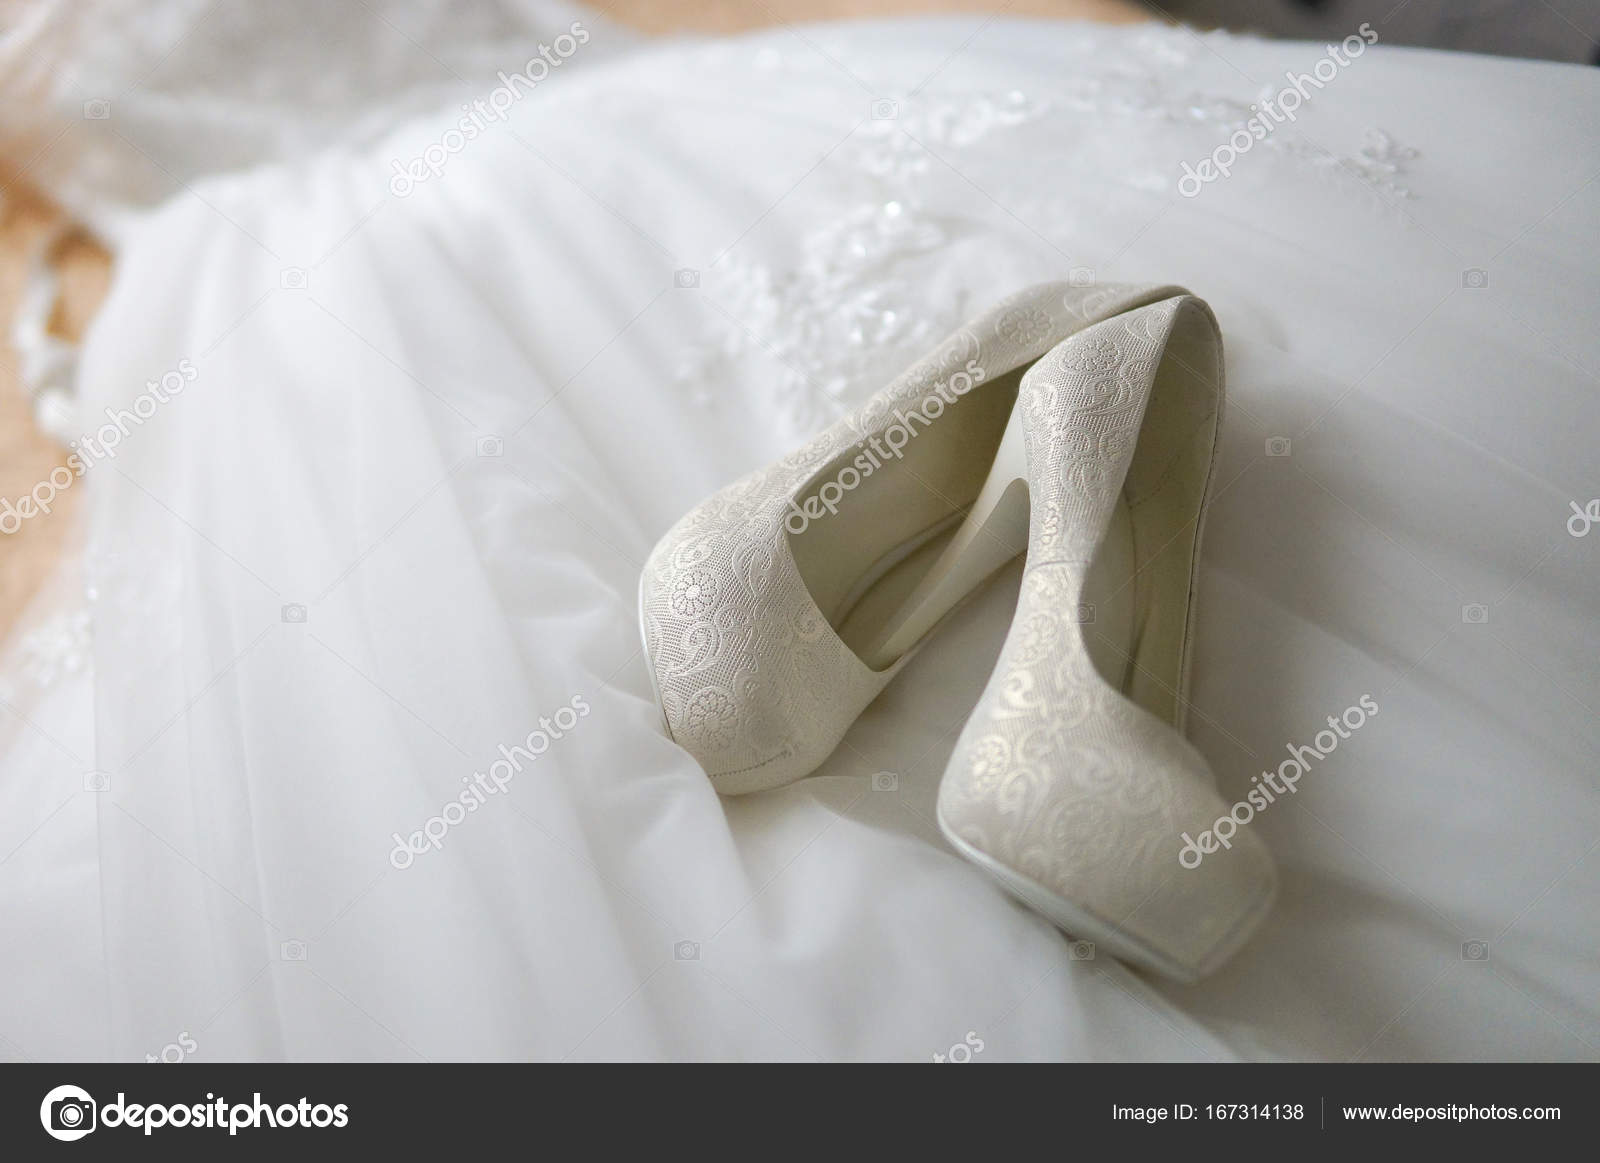 bec6ffd5331f Λευκά Νυφικά παπούτσια στο νυφικό, φως της ημέρας, ρηχό βάθος της προβολής  — Εικόνα από ...